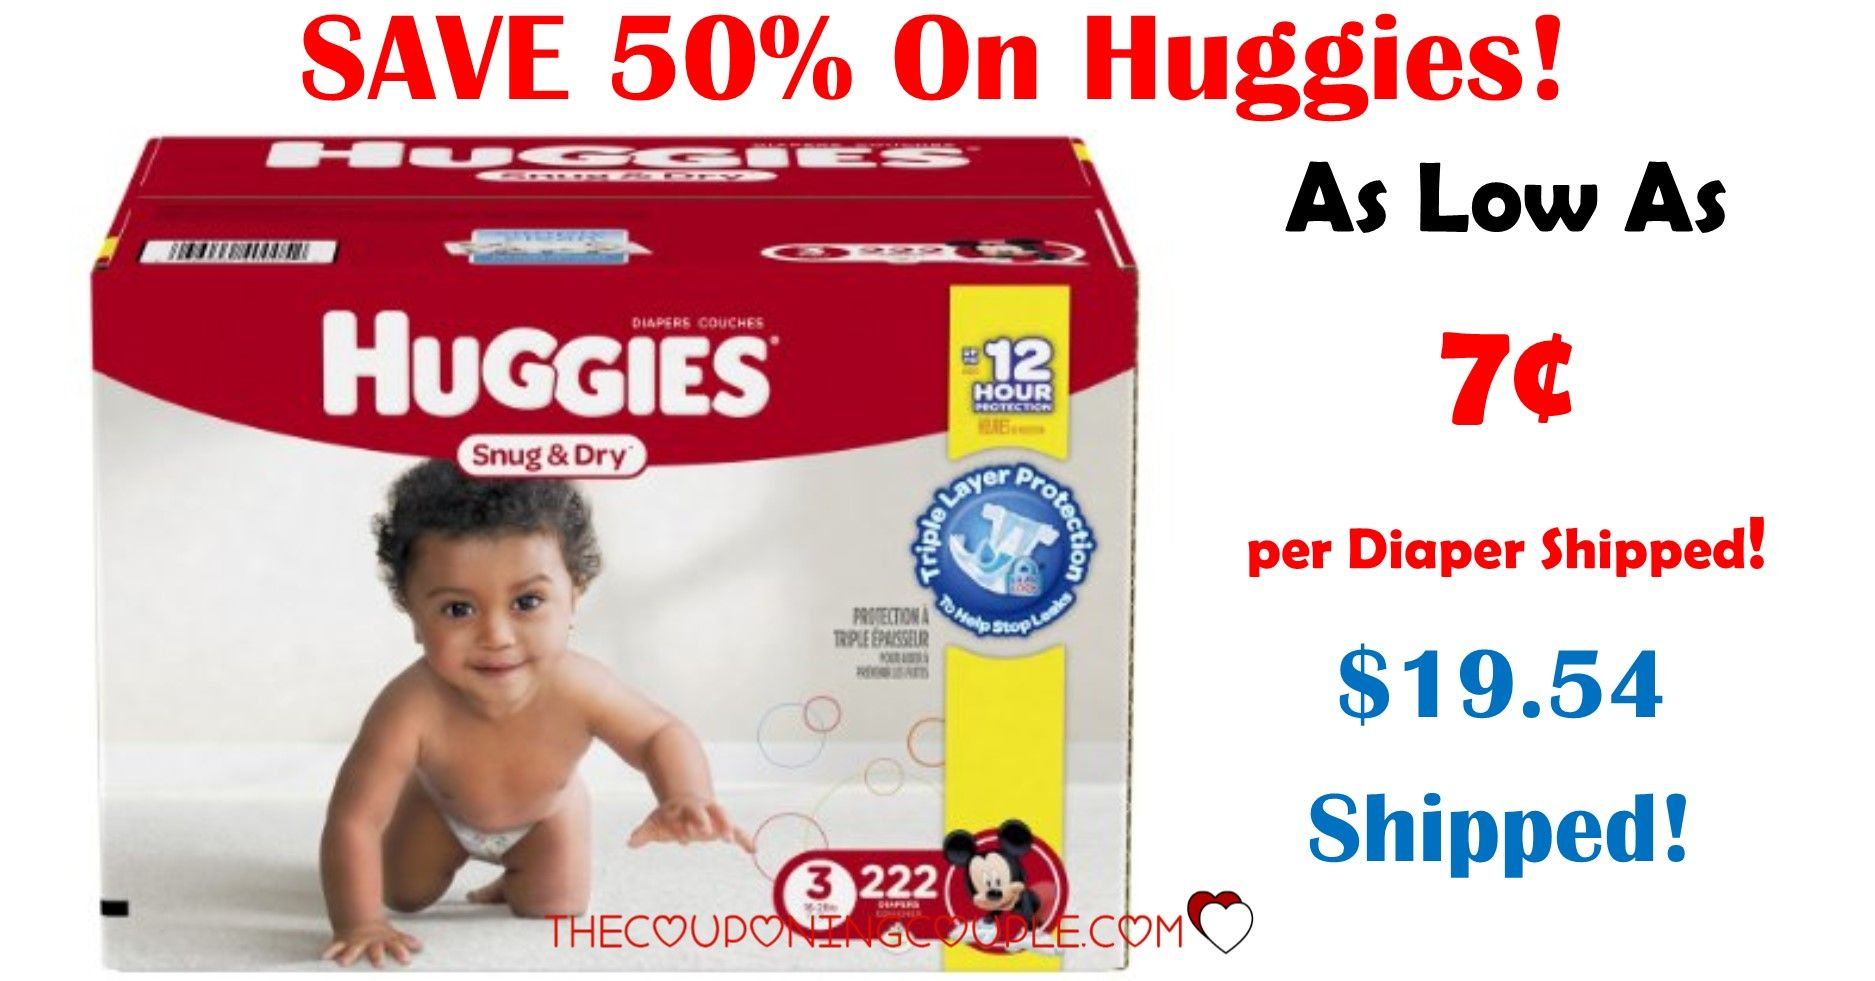 HOT Huggies Snug u Dry Diapers As Low As box Shipped